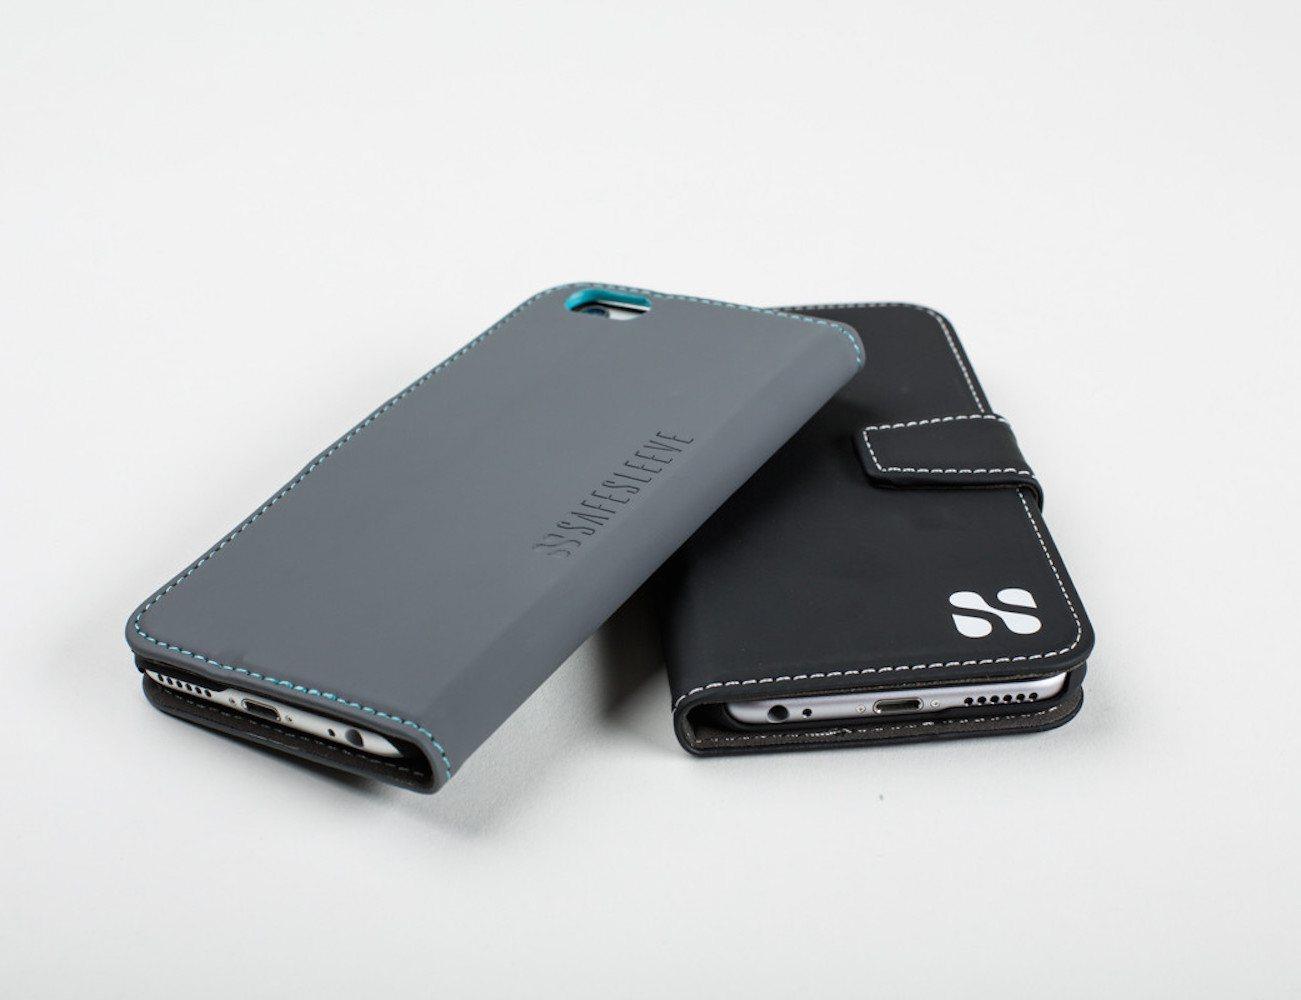 SafeSleeve iPhone 6 & Plus Case – Anti-Radiation and RFID Blocking Wallet